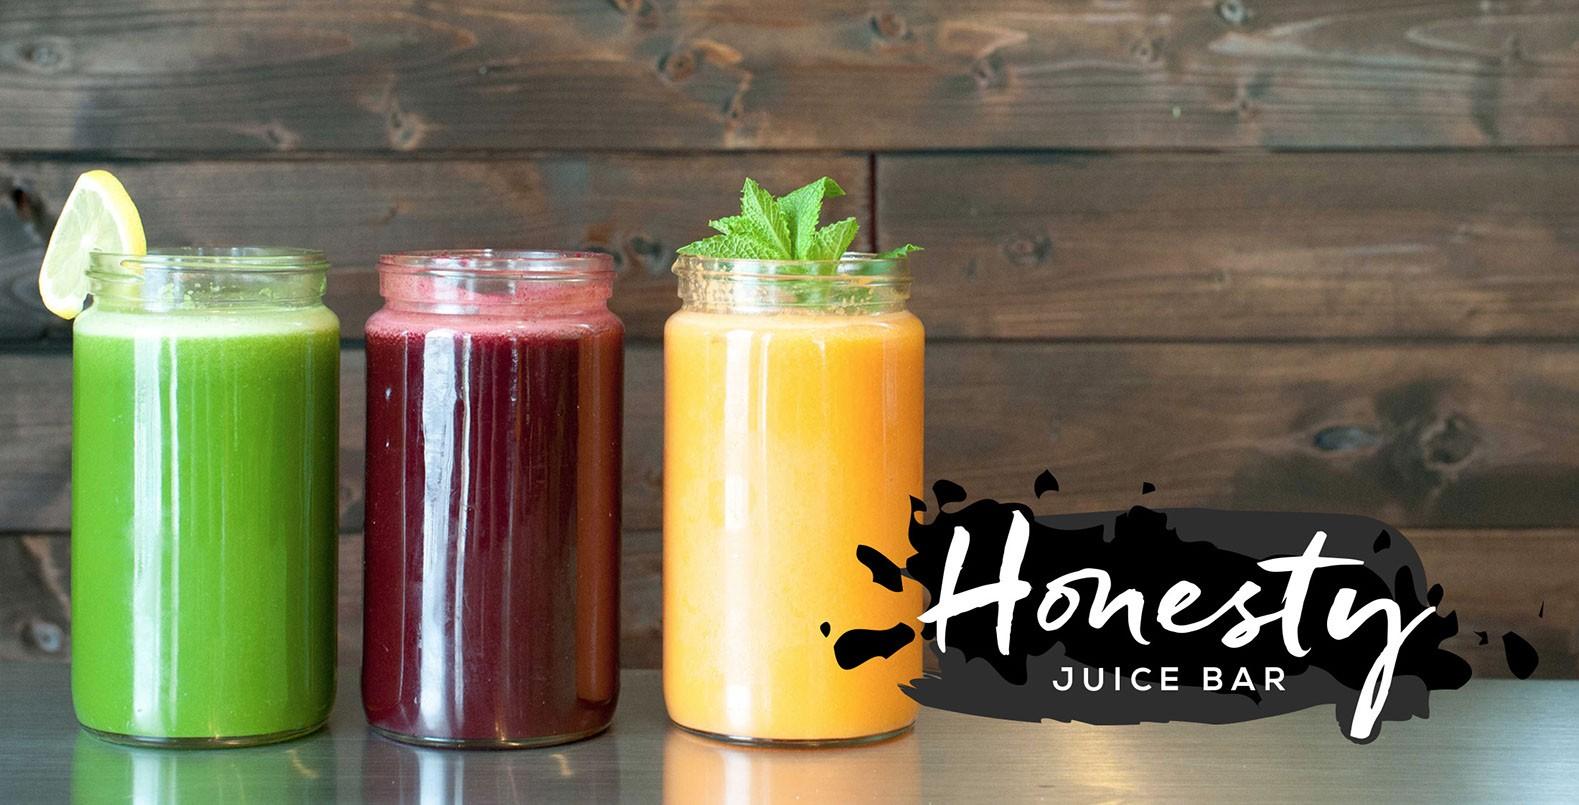 Honesty Juice Bar, hand painted ink black and white modern logo design